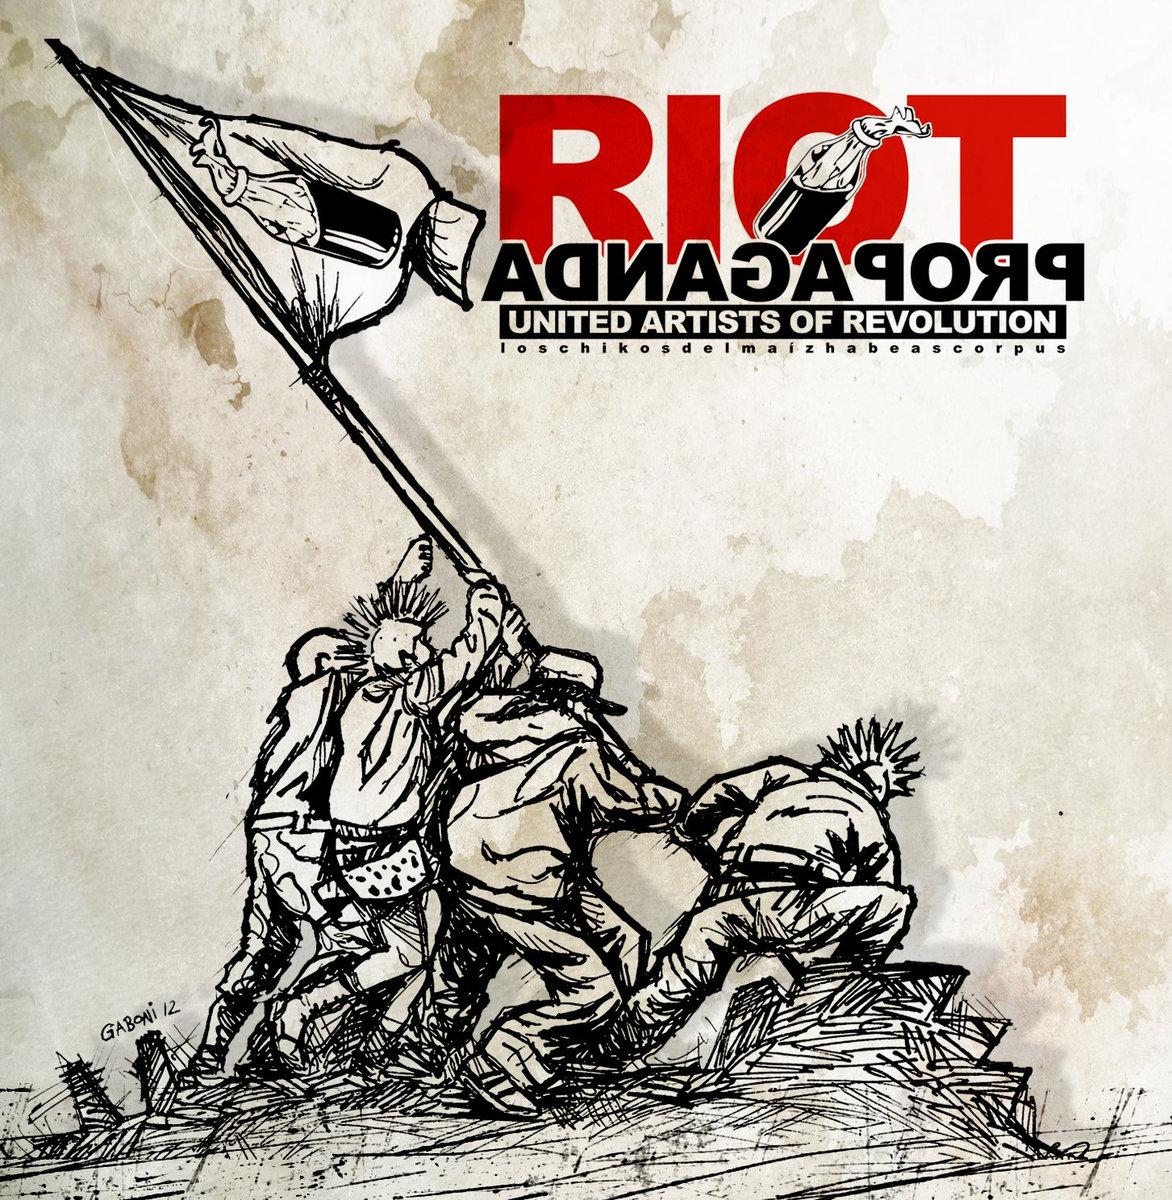 Riot Propaganda (Foto: Web oficial Riot Propaganda)